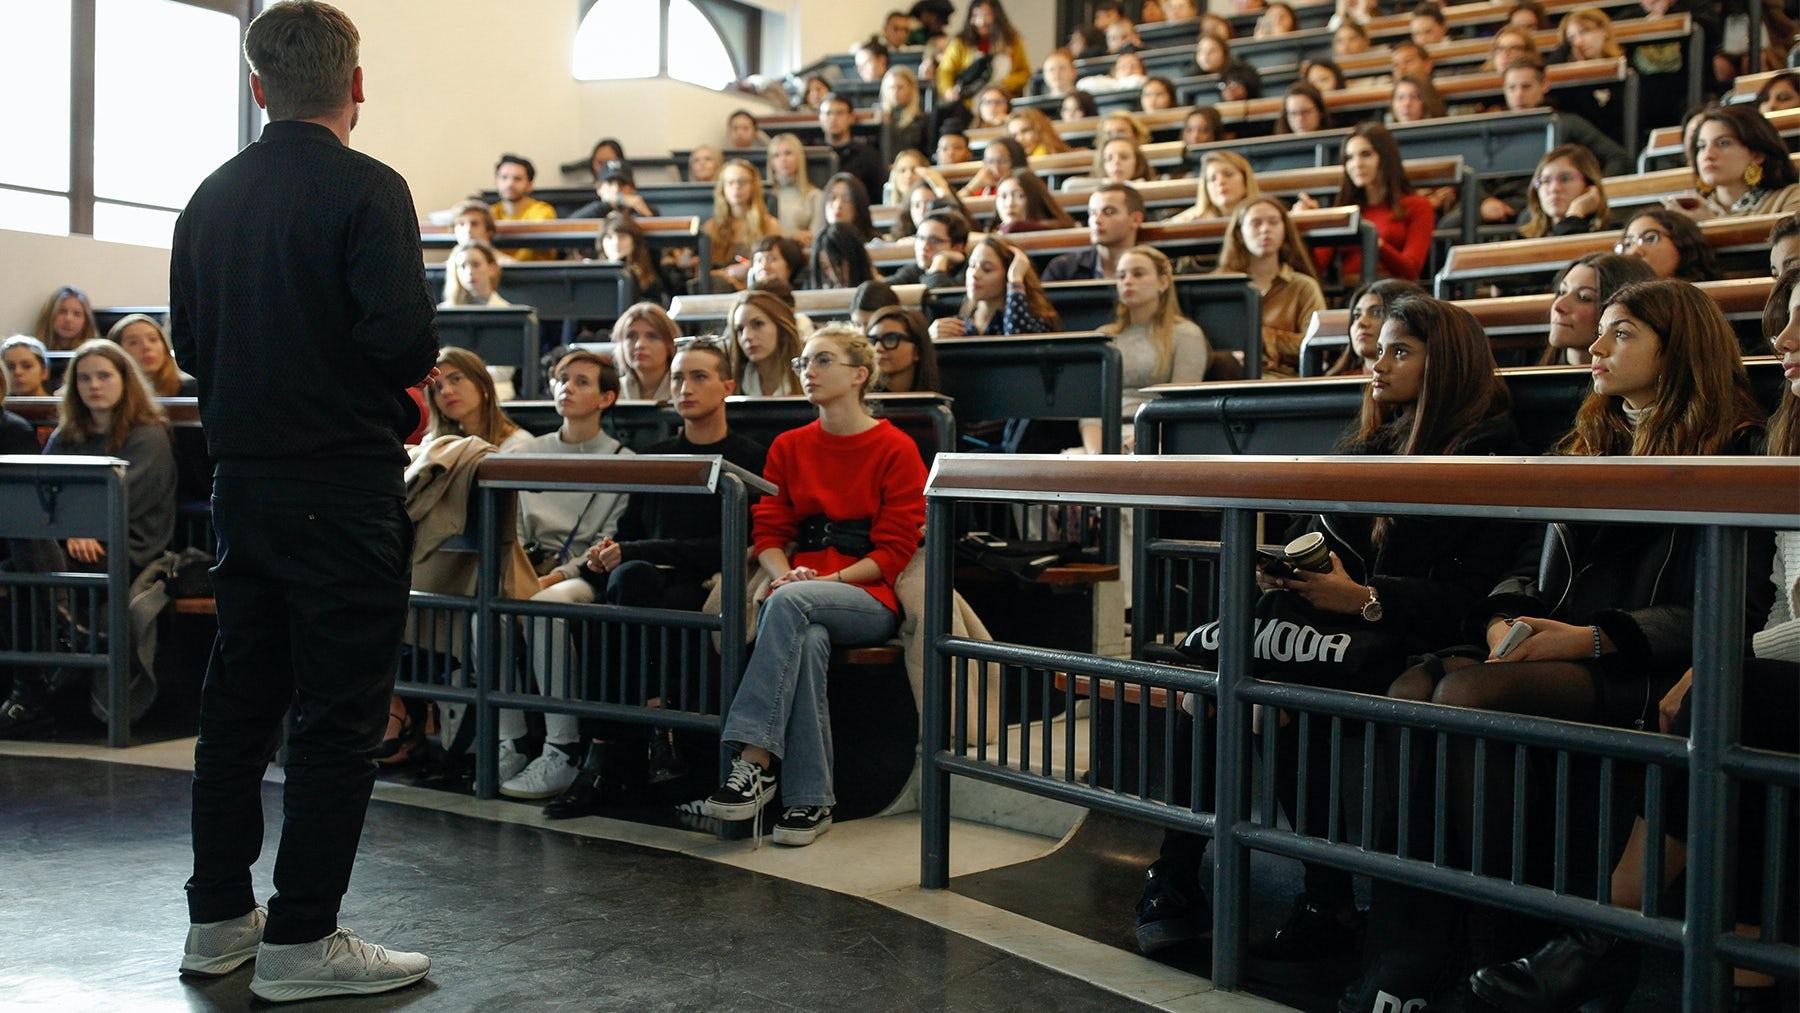 Torsten Hochstetter, Global Creative Director at Puma, teaching at Polimoda by Federica Fioravanti | Source: Courtesy